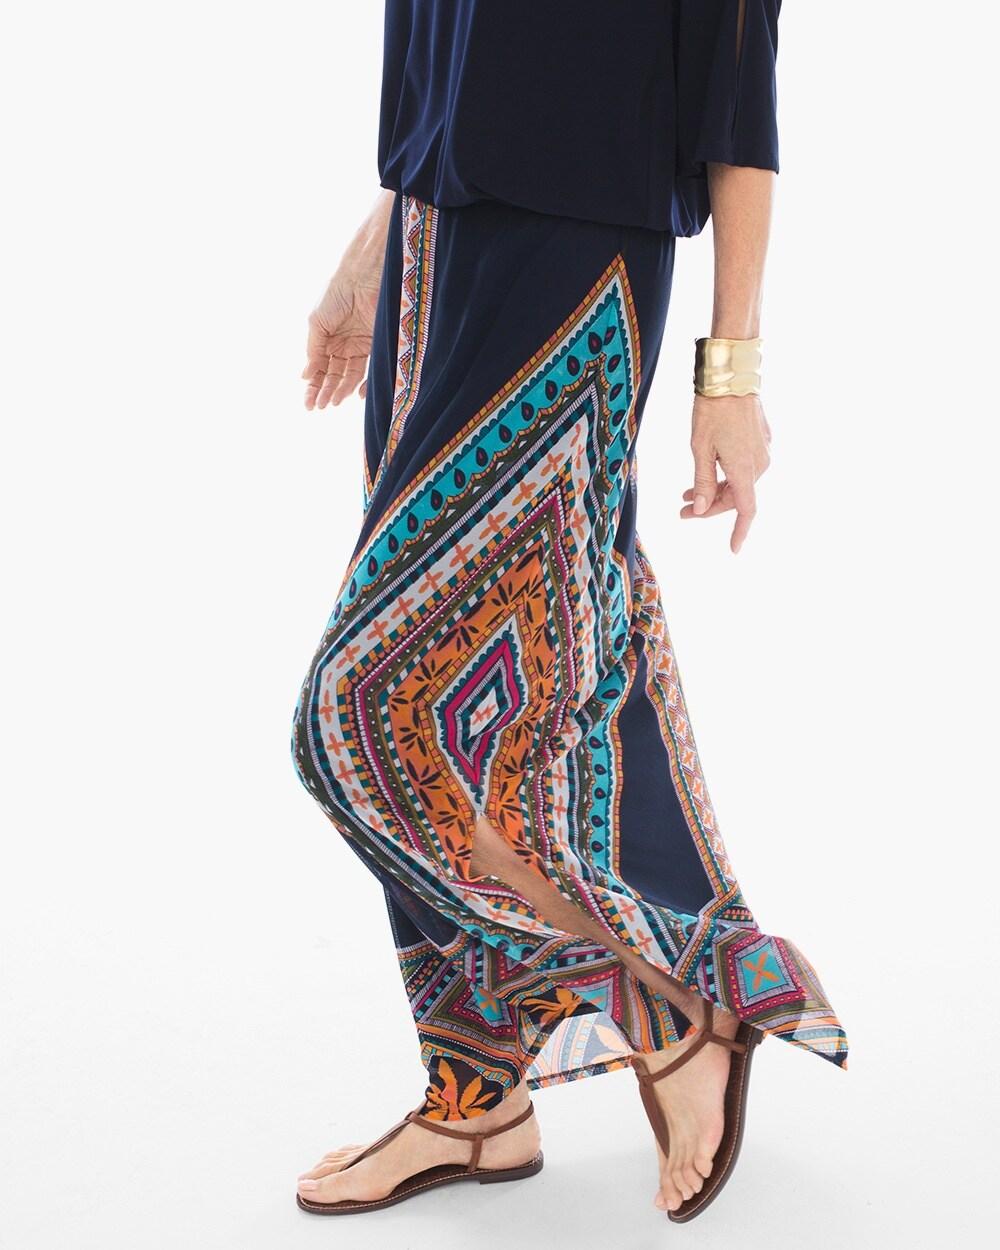 359dbe98da Diamond Multi-Print Maxi Skirt - Chico's